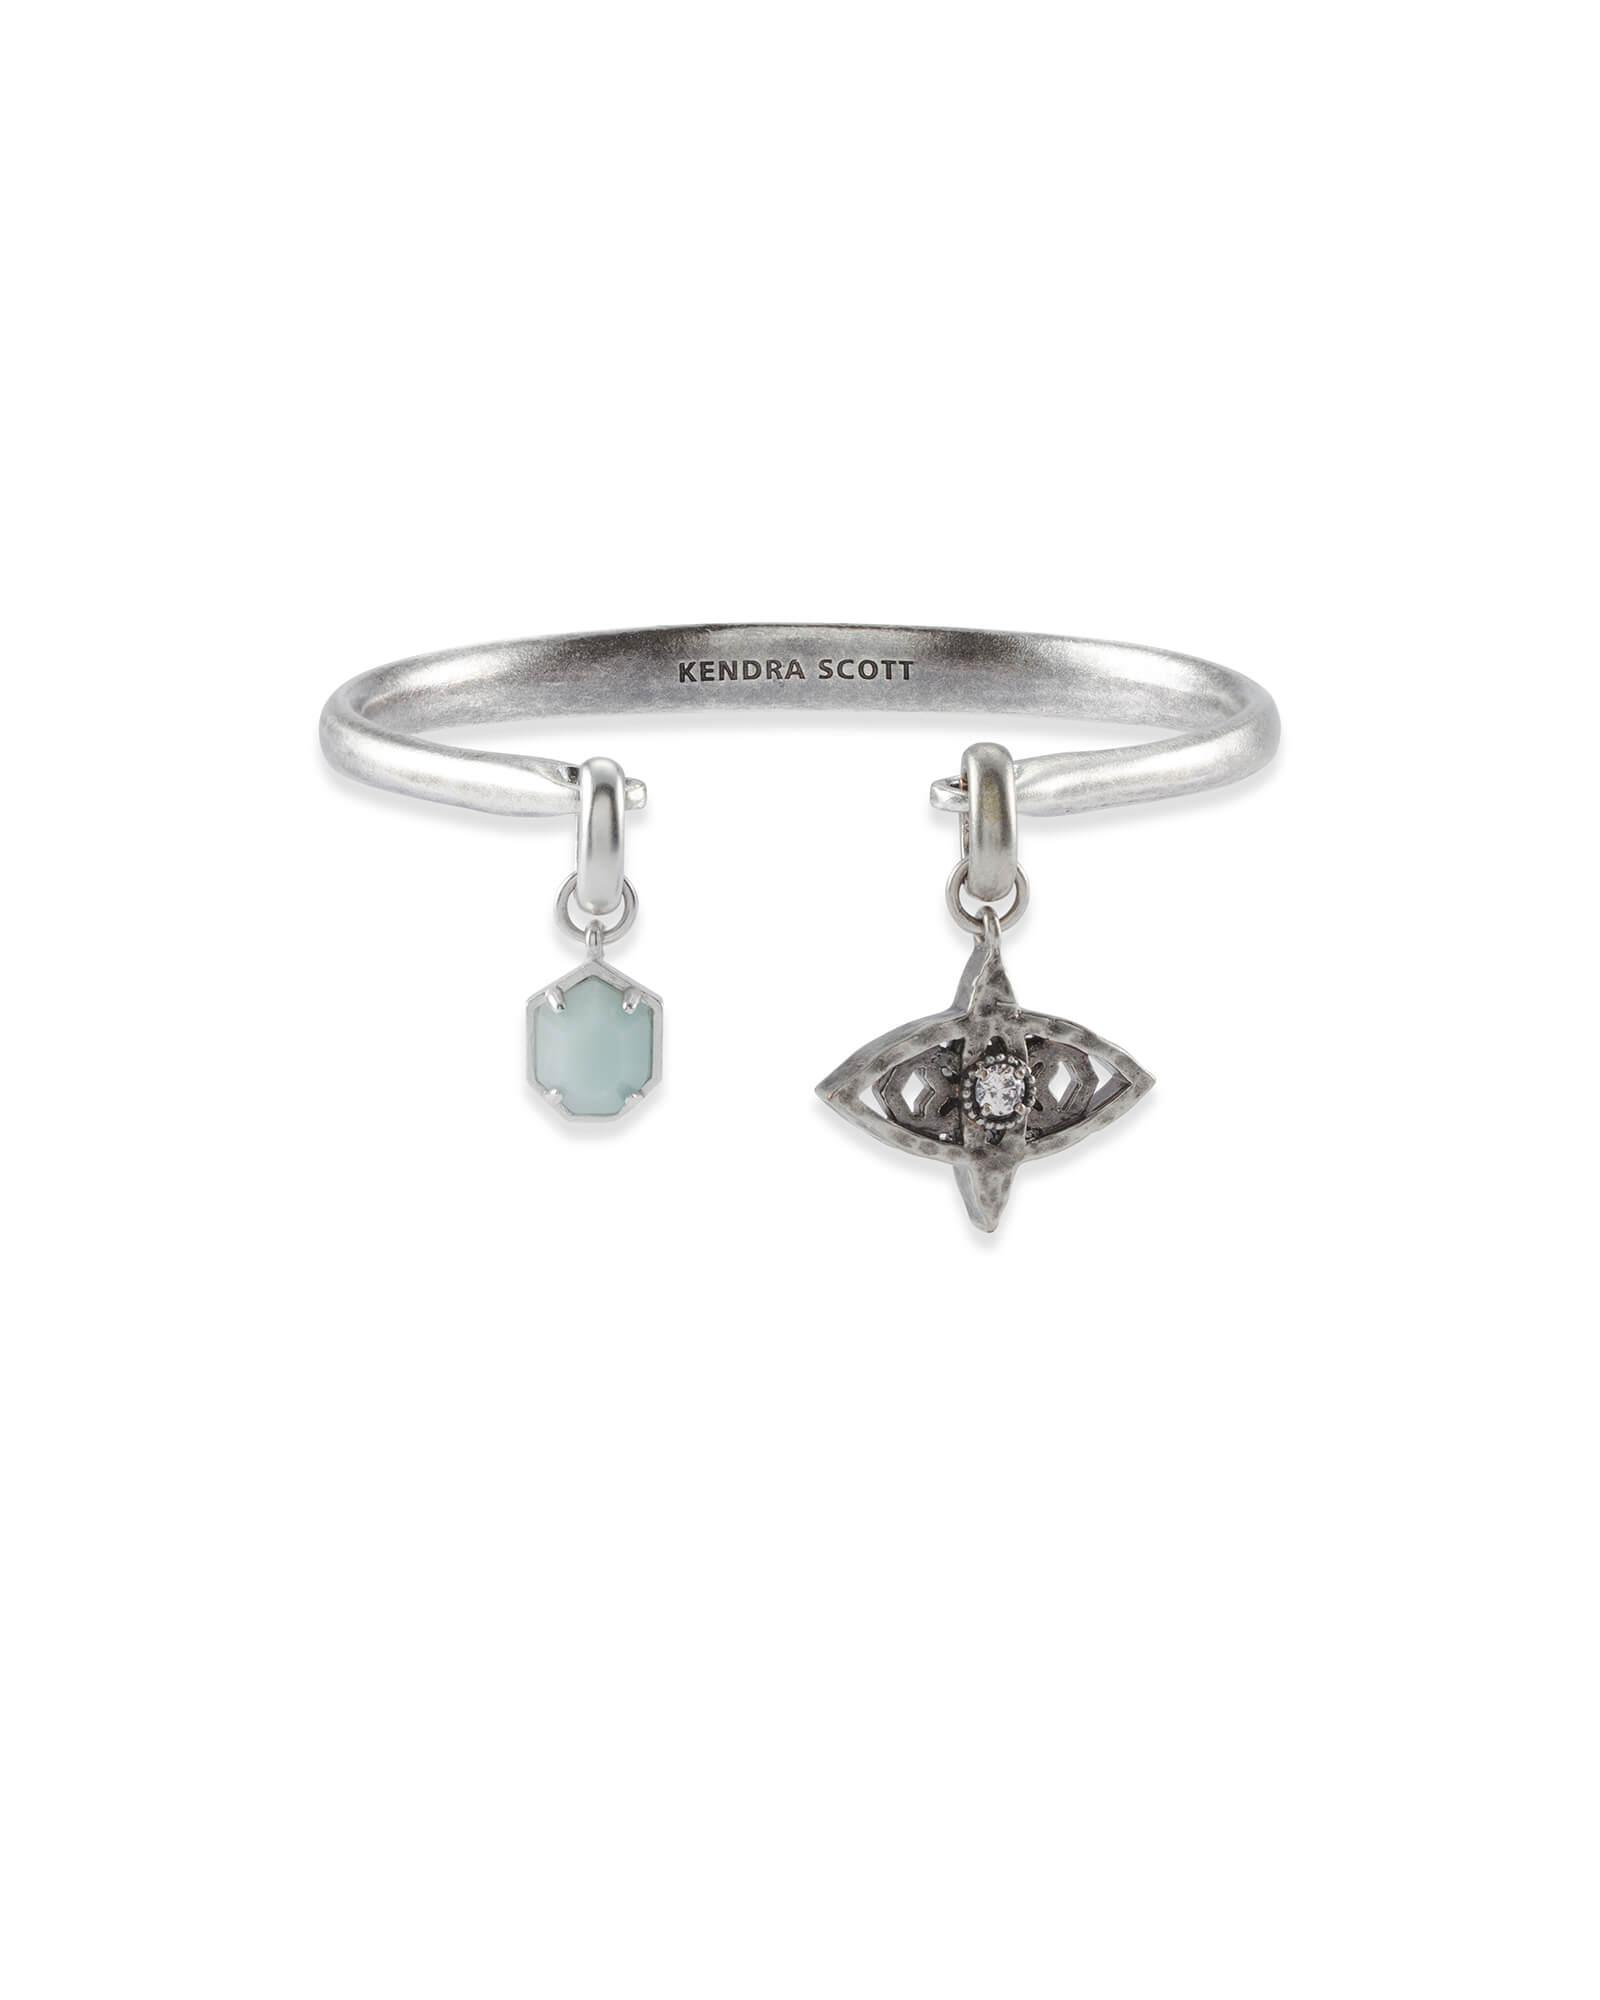 84c3bbe84dc Good Fortune Charm Bracelet Set in Vintage Silver | Kendra Scott